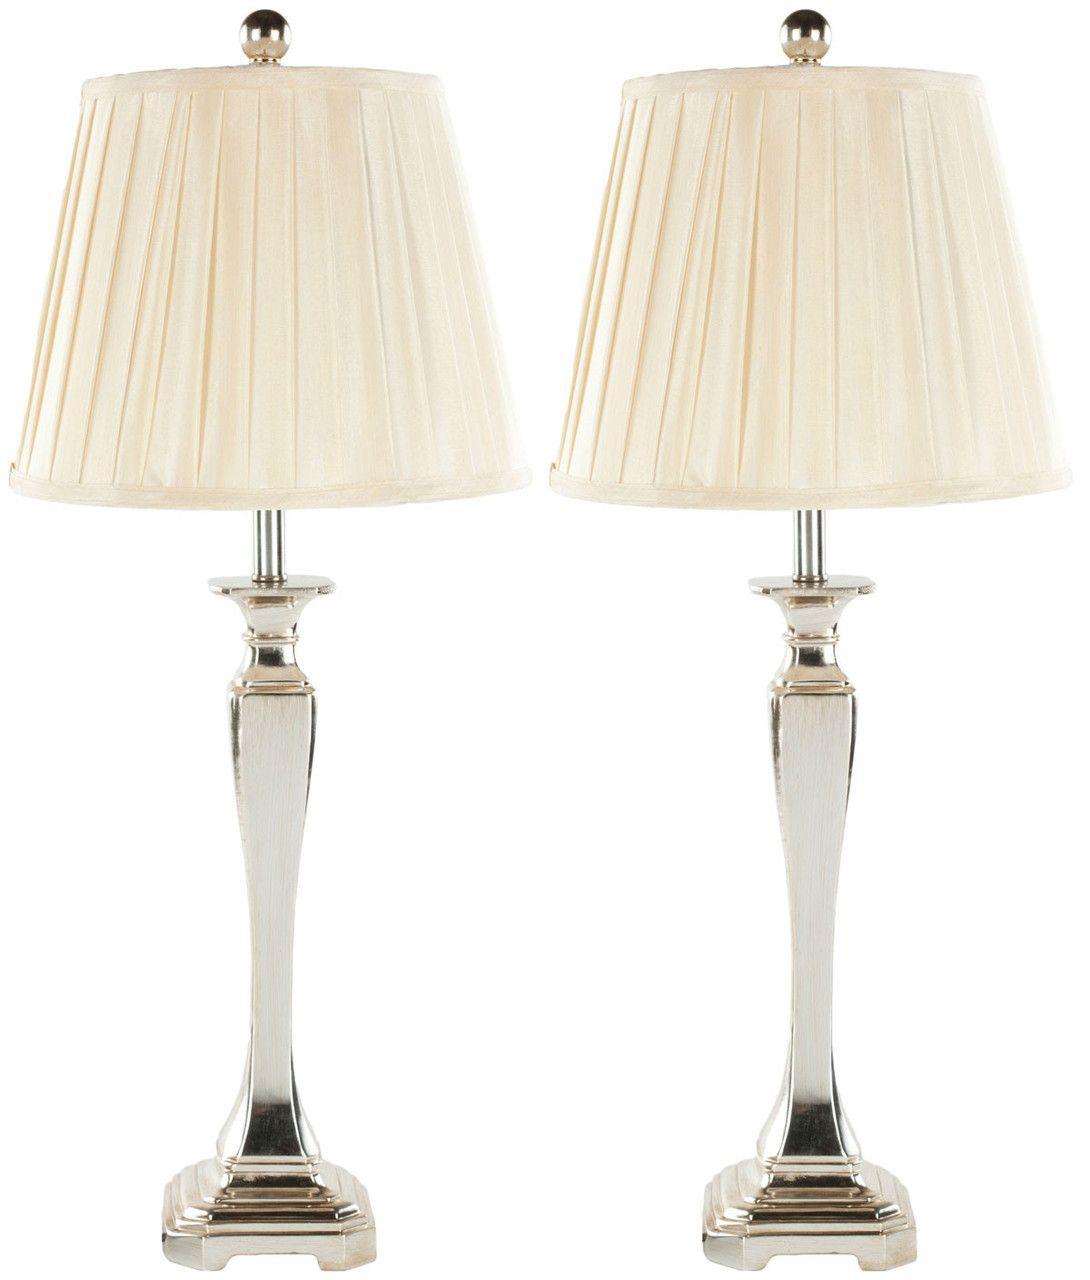 Safavieh Athena 28Inch Table Lamp LIT4025ASET2 Silver